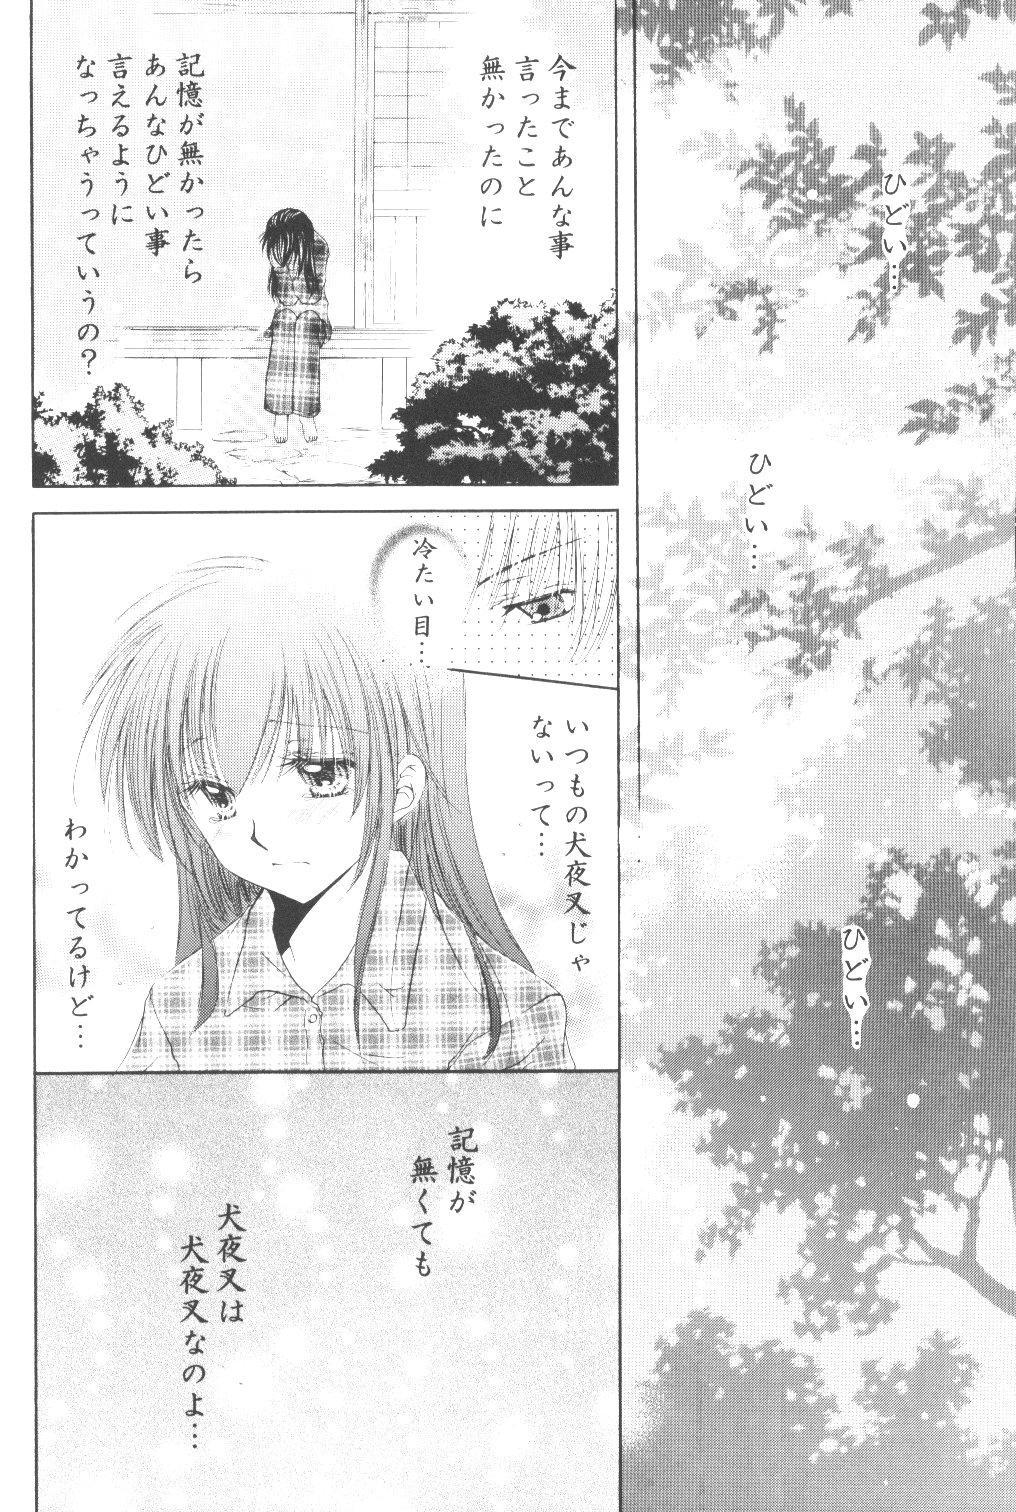 Ryuusei Ryodan 17